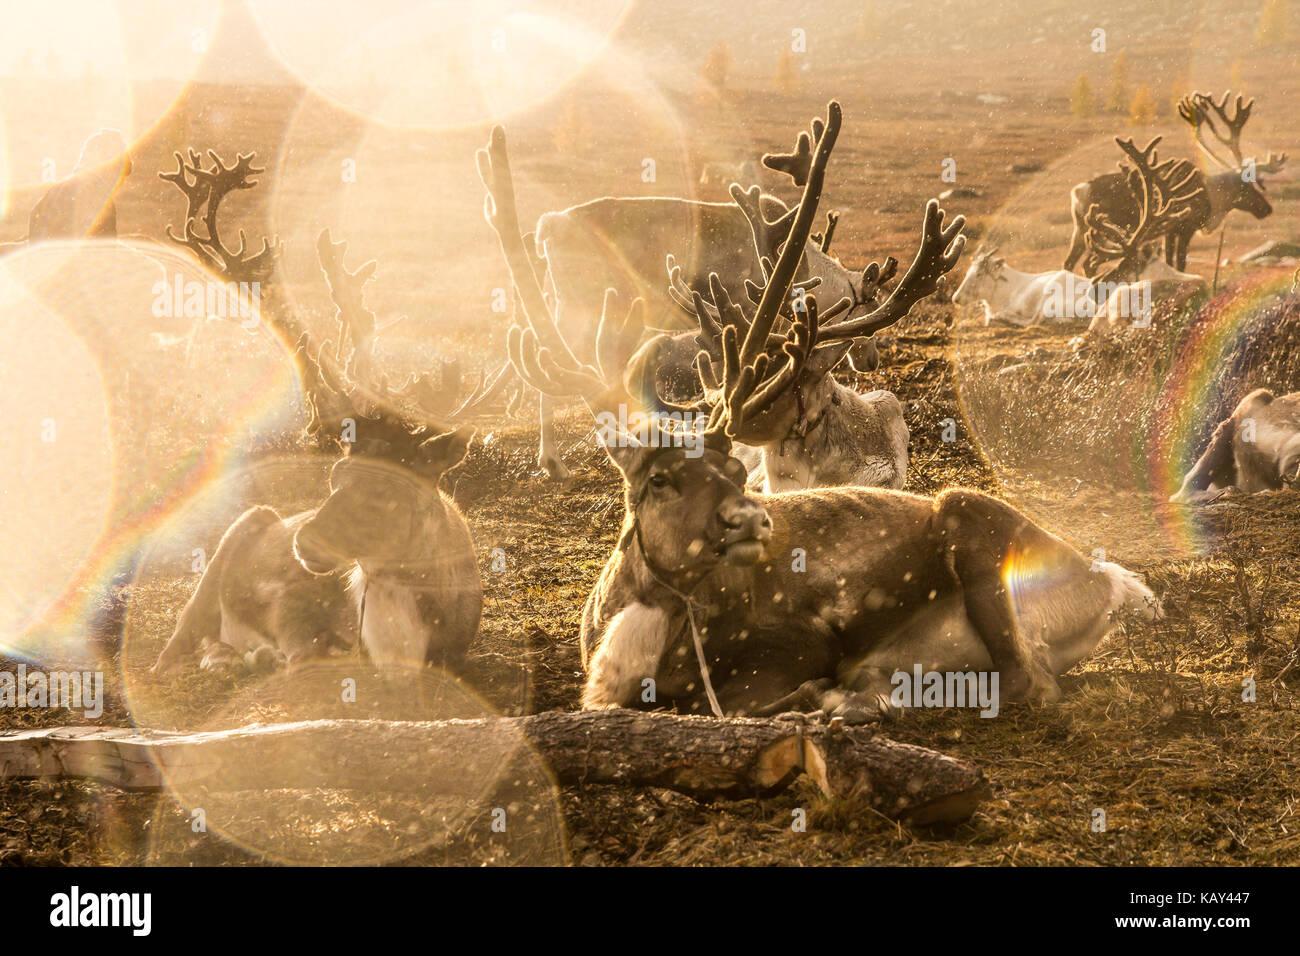 Herd of reindeers captured during a rainstorm through sunglare. Khuvsgol, Mongolia. - Stock Image